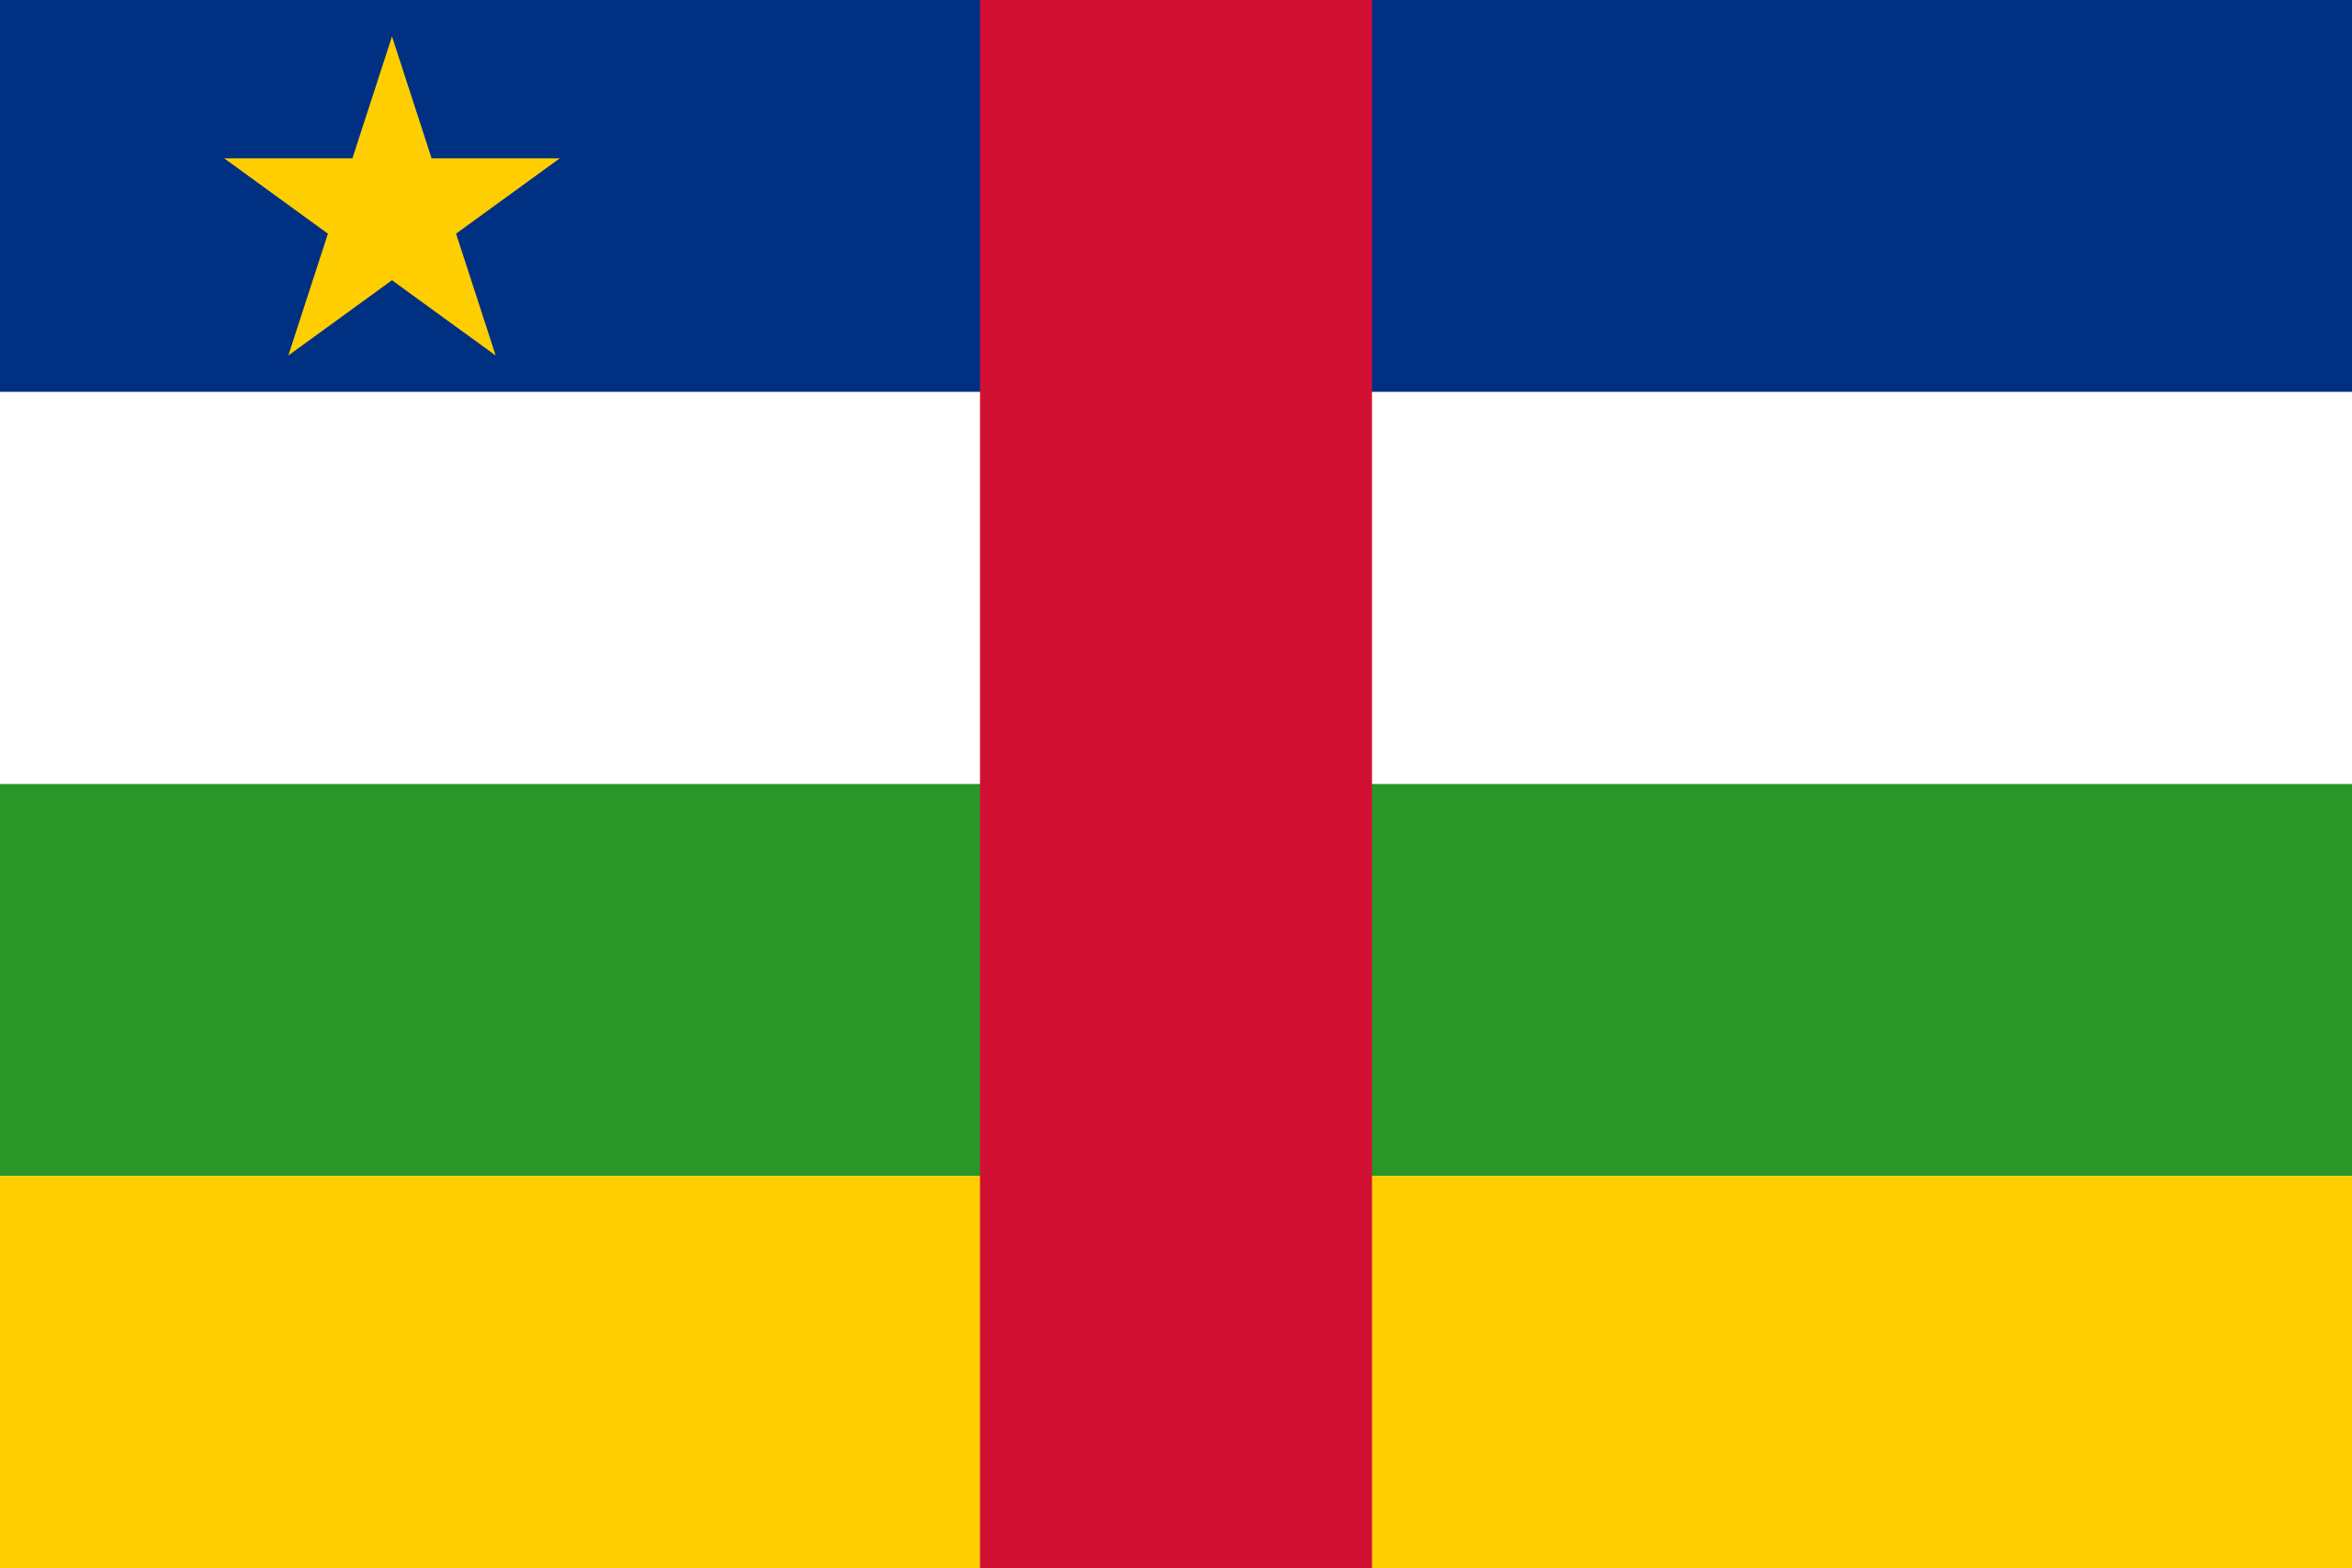 república centroafricana, страна, Эмблема, логотип, символ - Обои HD - Профессор falken.com